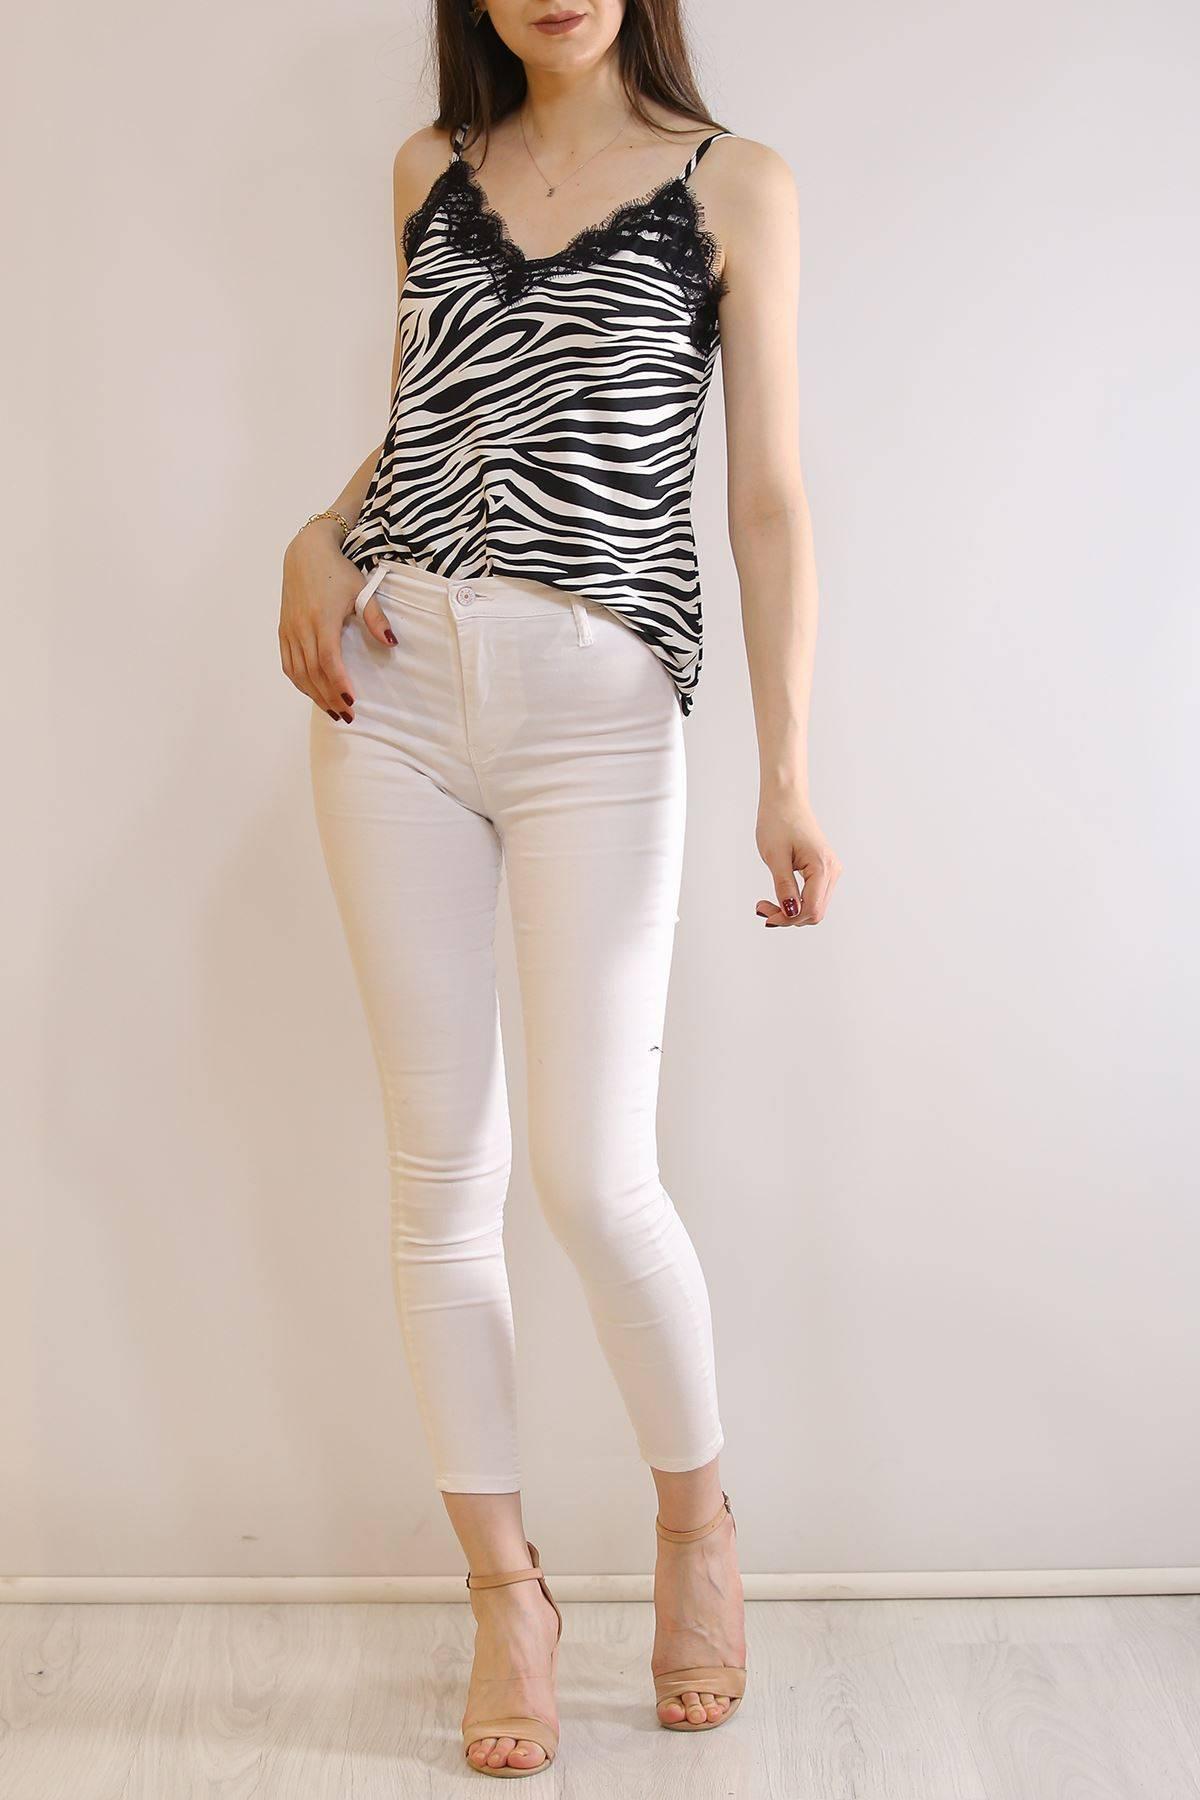 Yaka Dantelli Atlet Zebra - 6048.1212.